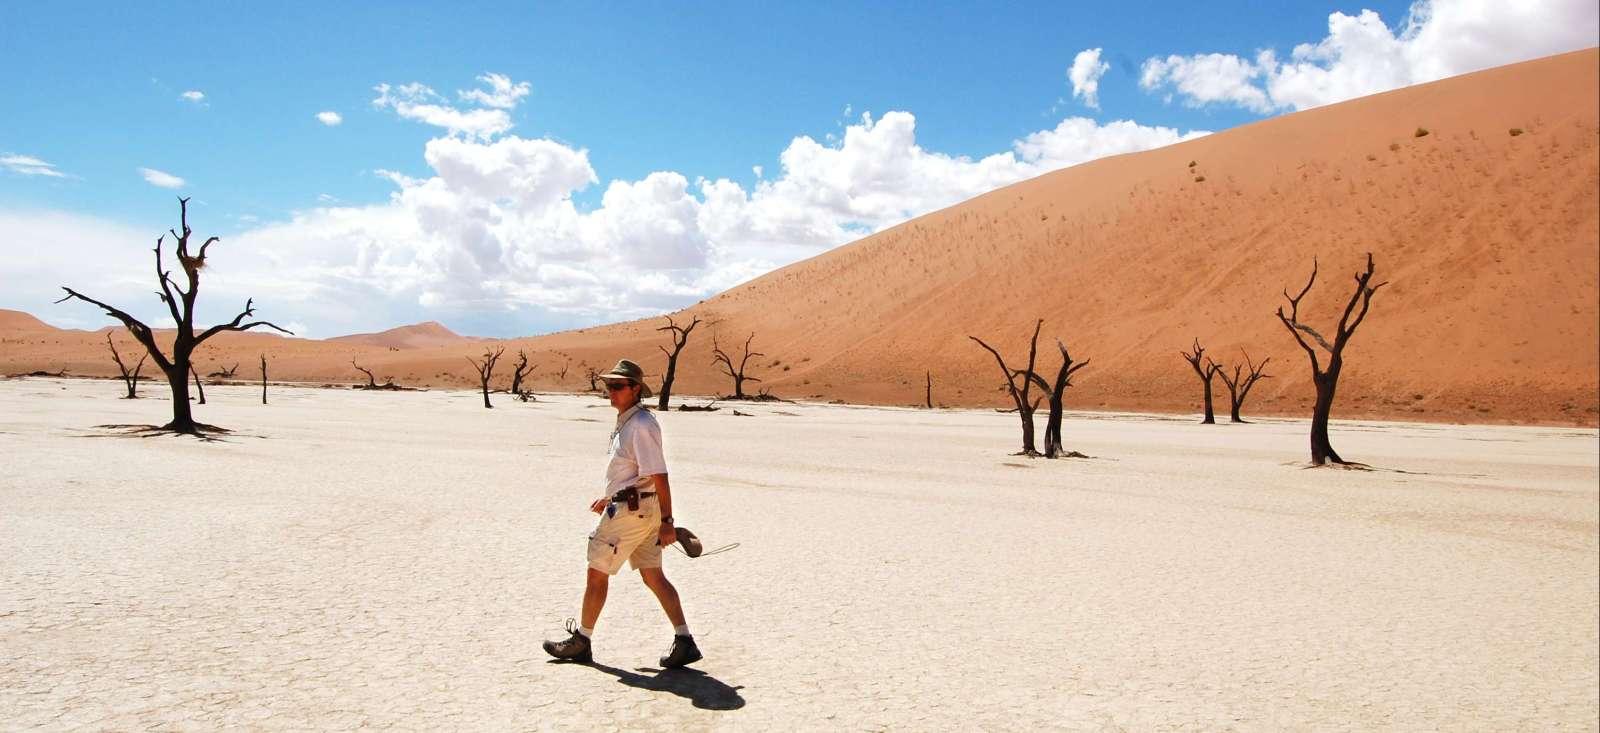 Voyage avec des animaux : Namibie : Balade australe